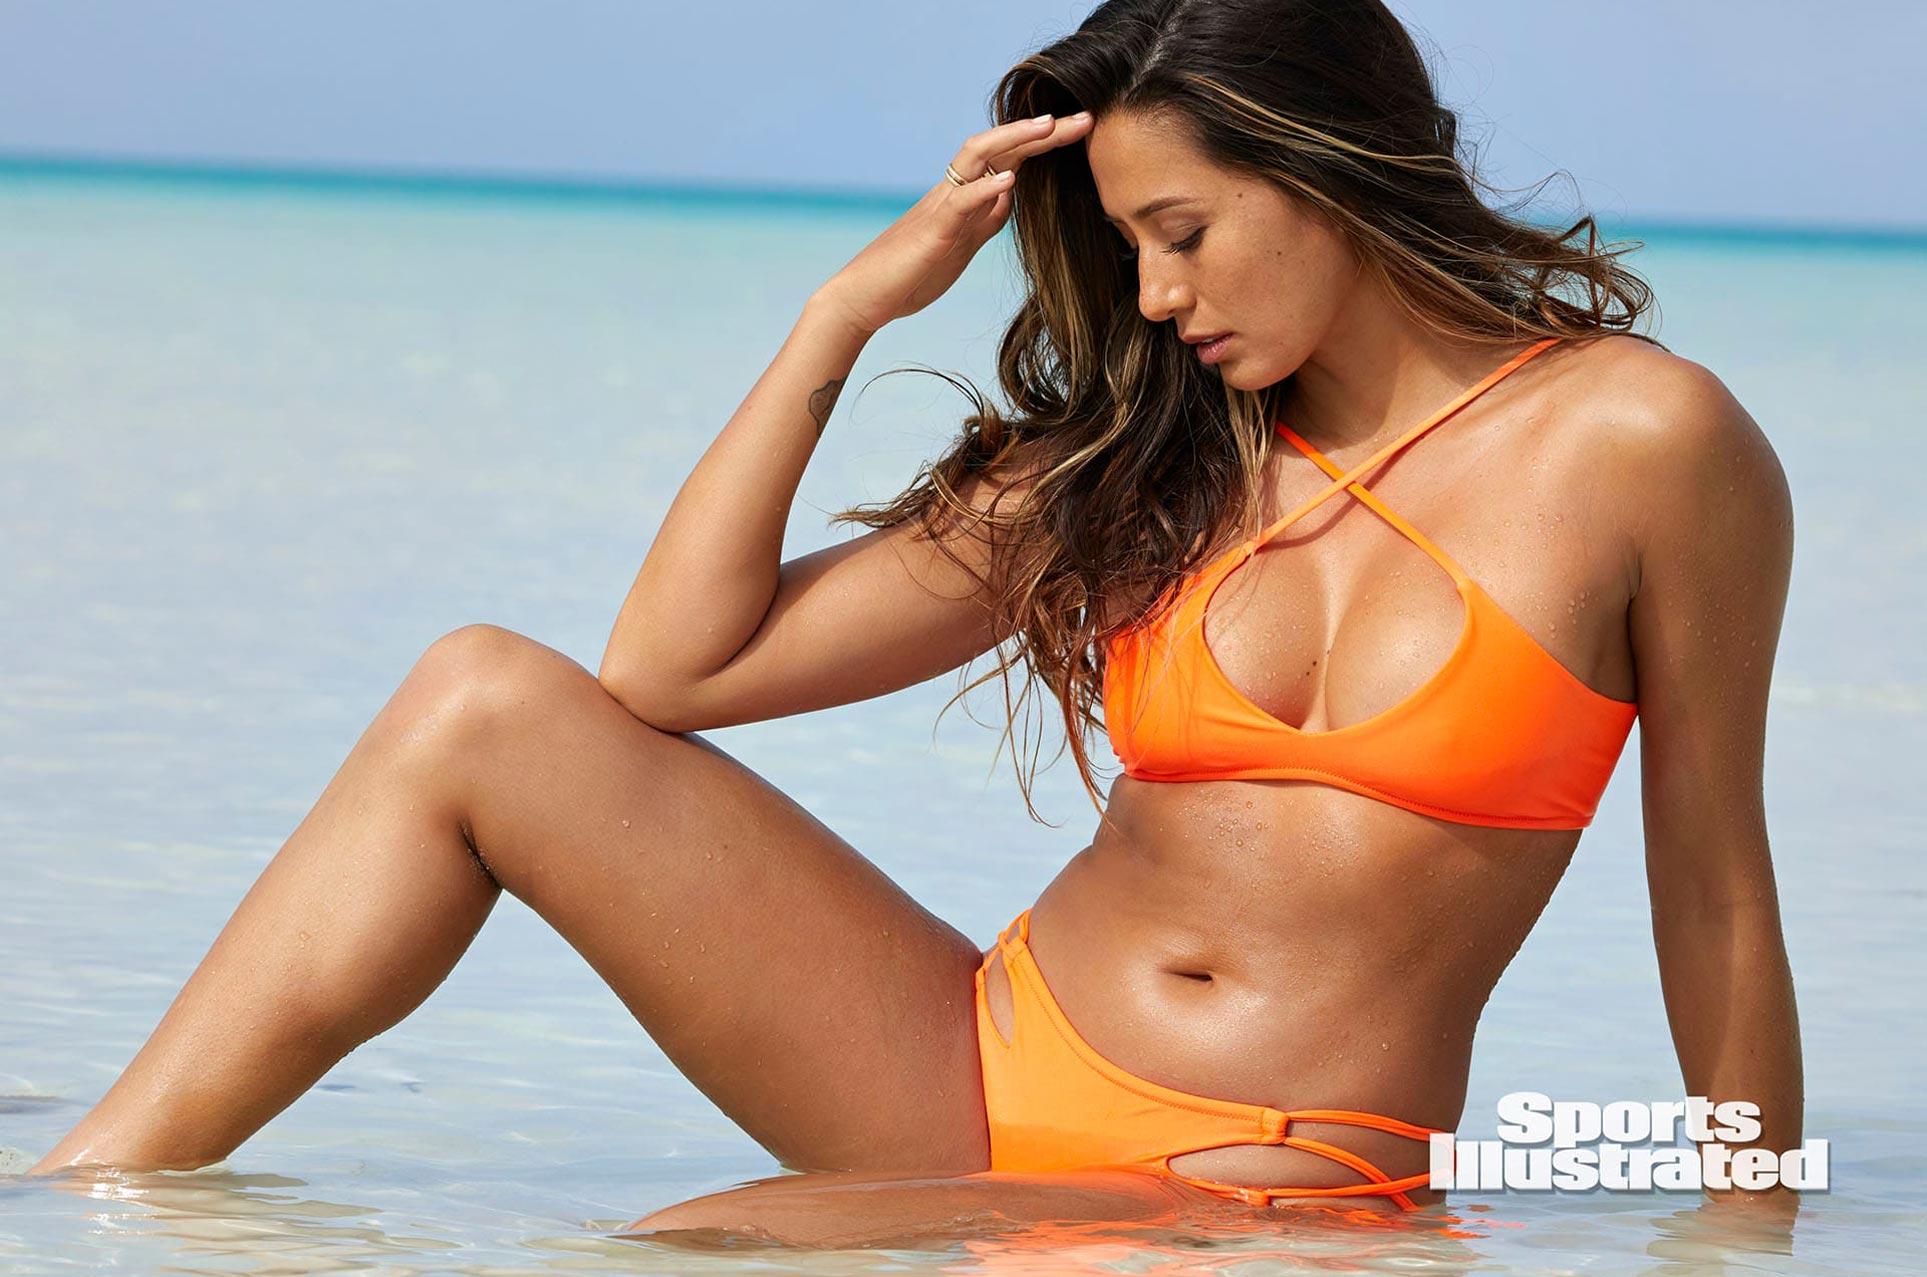 Малия Мануэль в каталоге купальников Sports Illustrated Swimsuit 2020 / фото 18